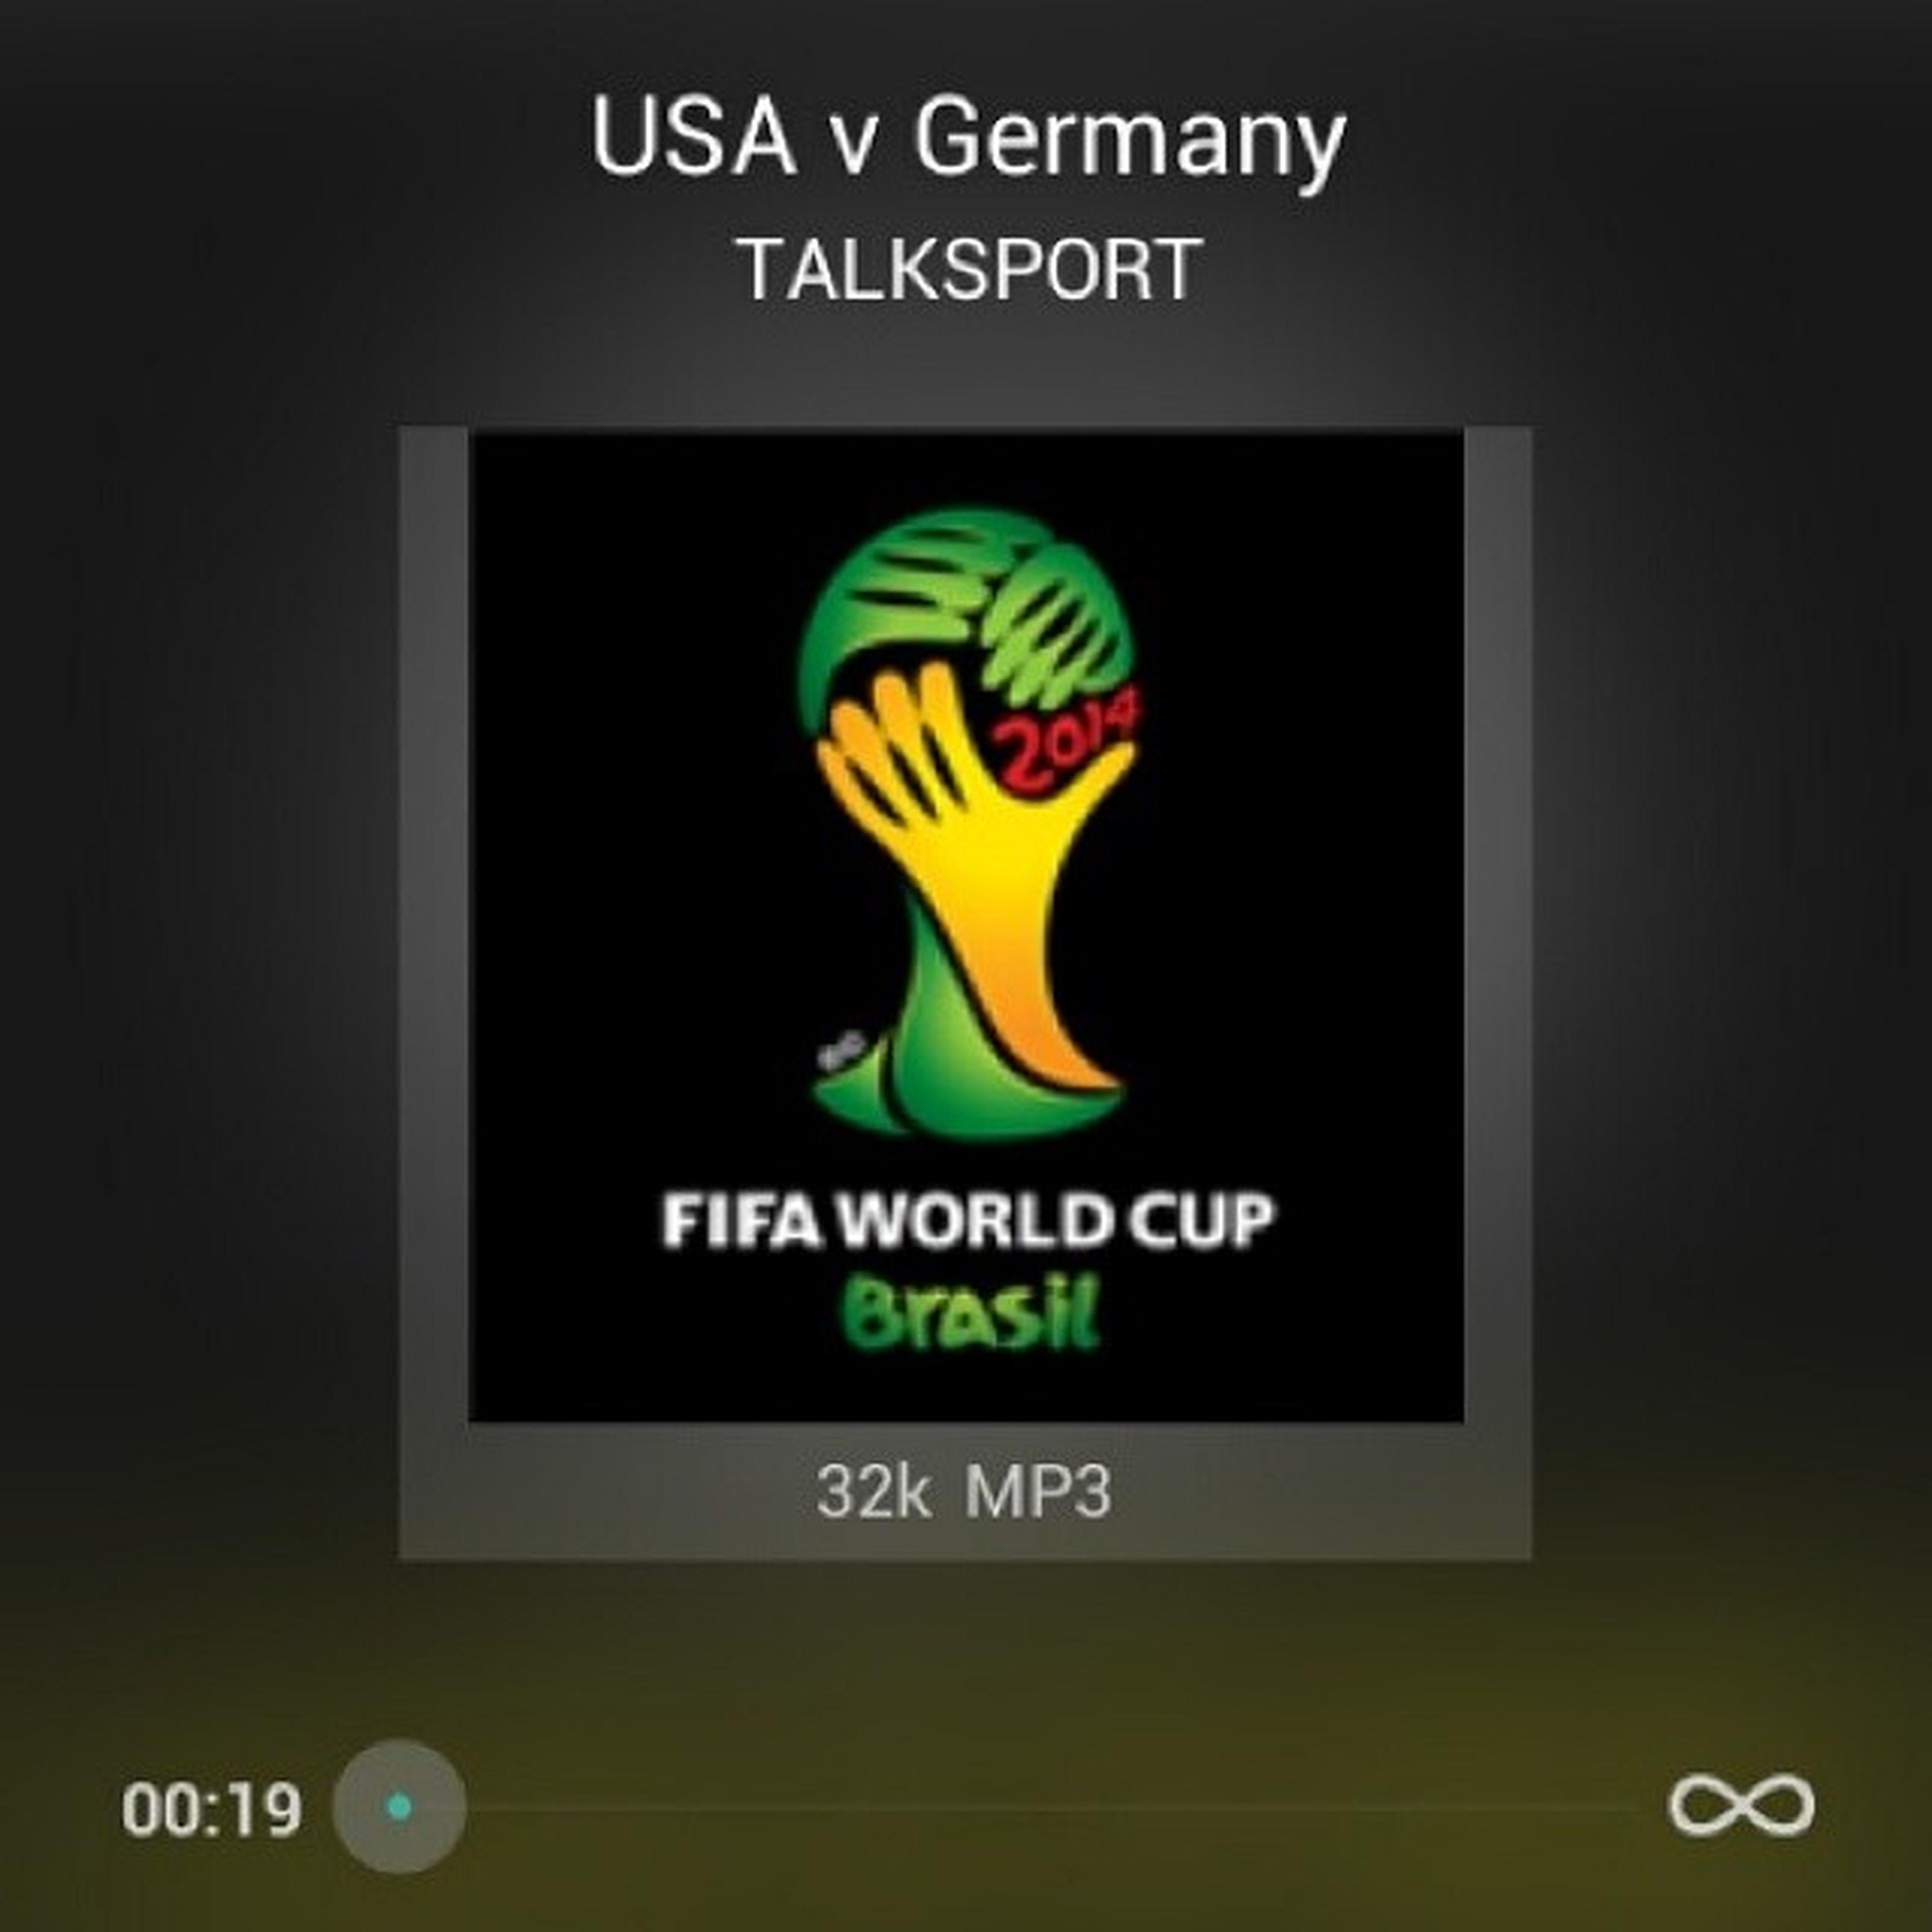 When u have no television. Worldcup2014 แอ๊บฟังฝึกภาษา ดูบอลไม่เป็นกูก็ฟังเอา อืม